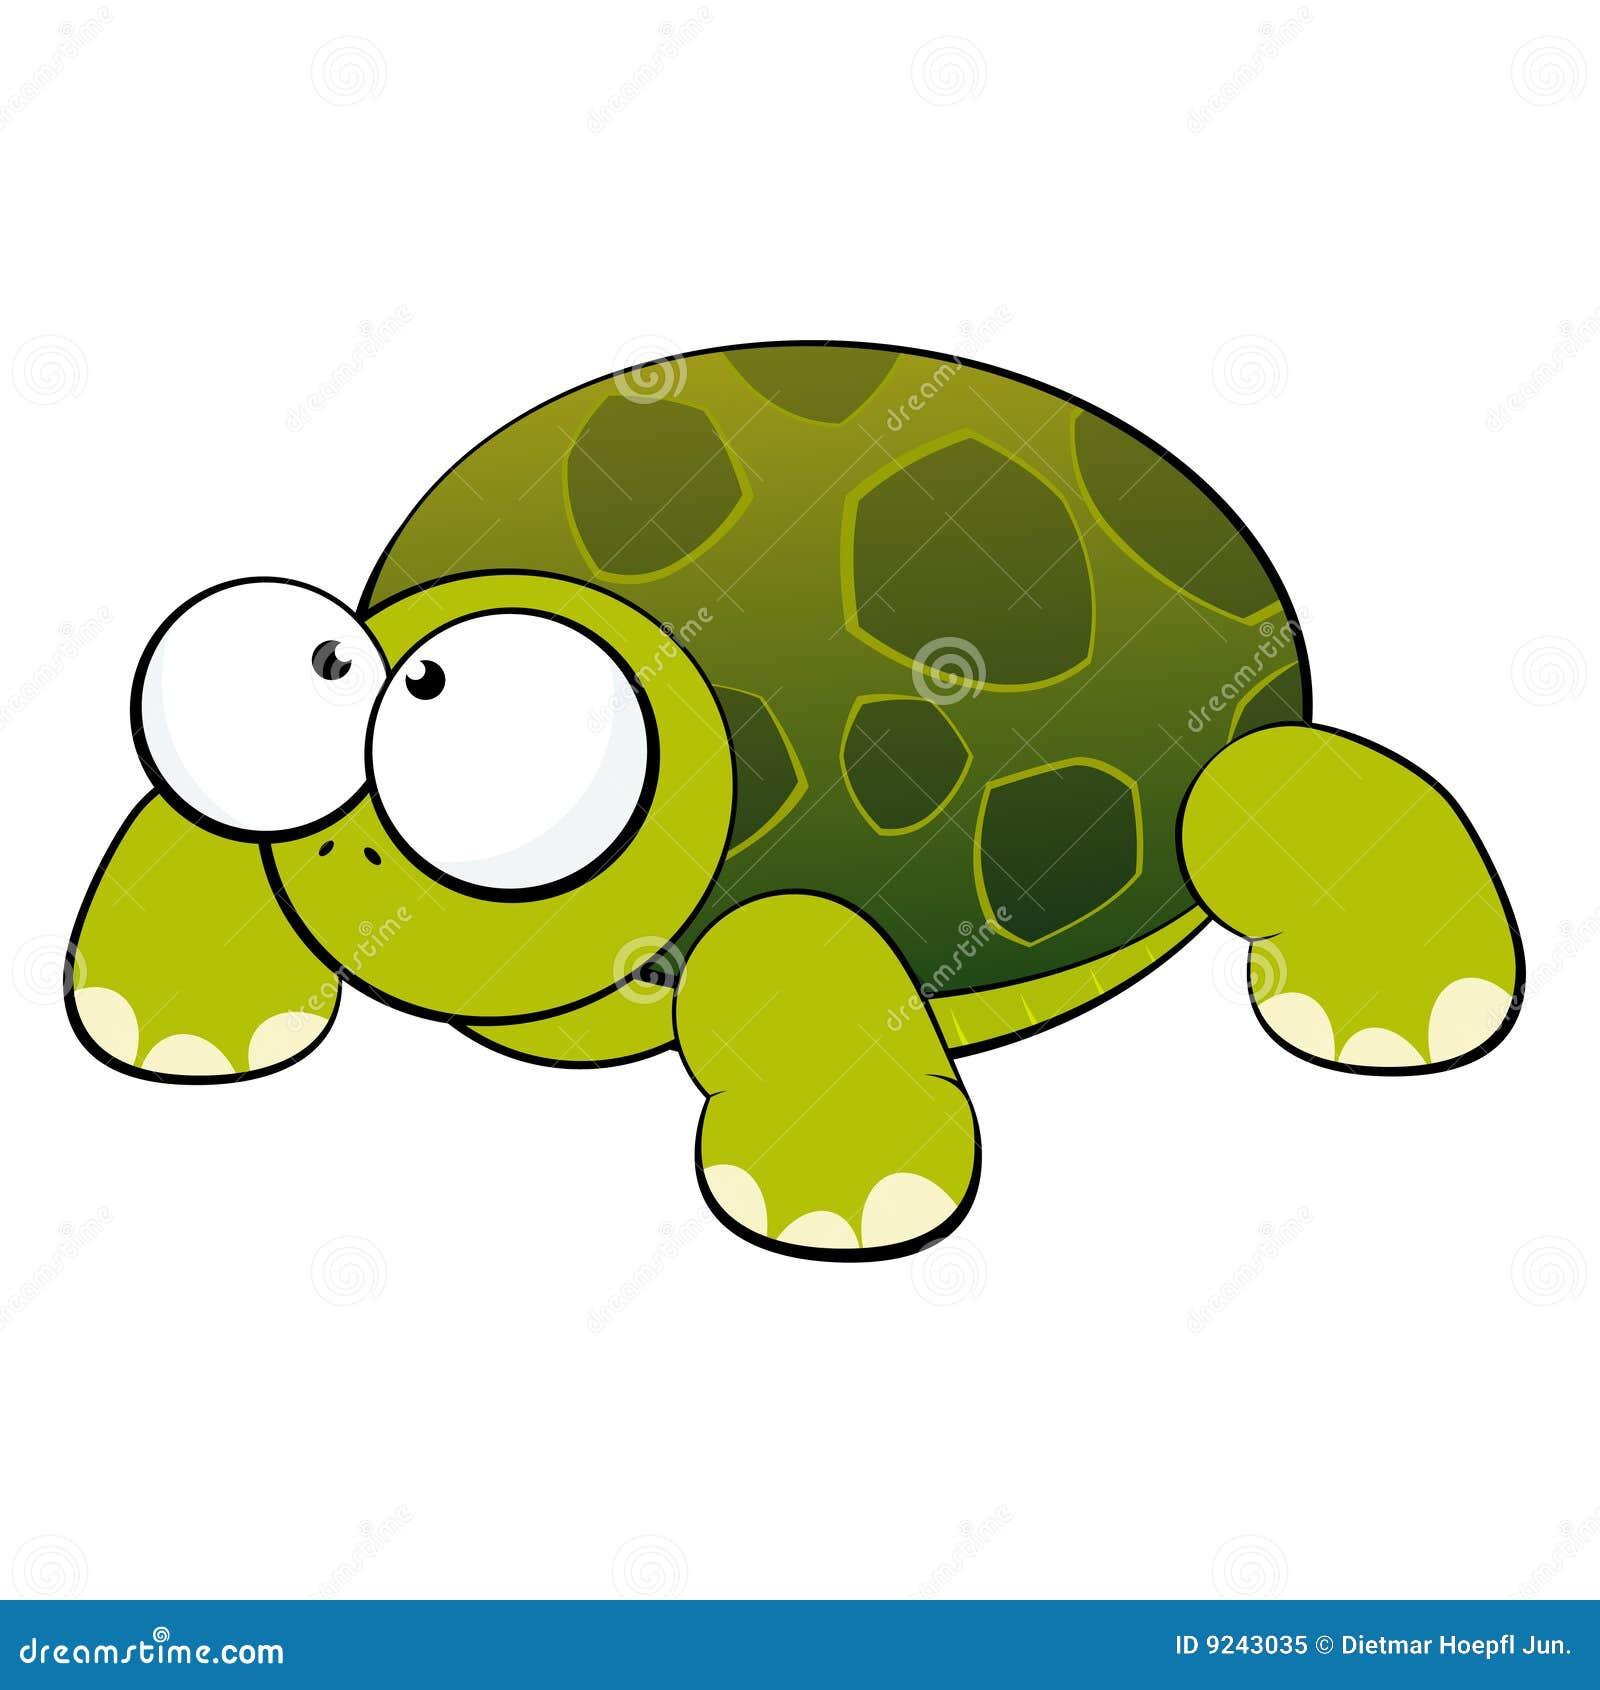 Cute cartoon turtle with big eyes - photo#13